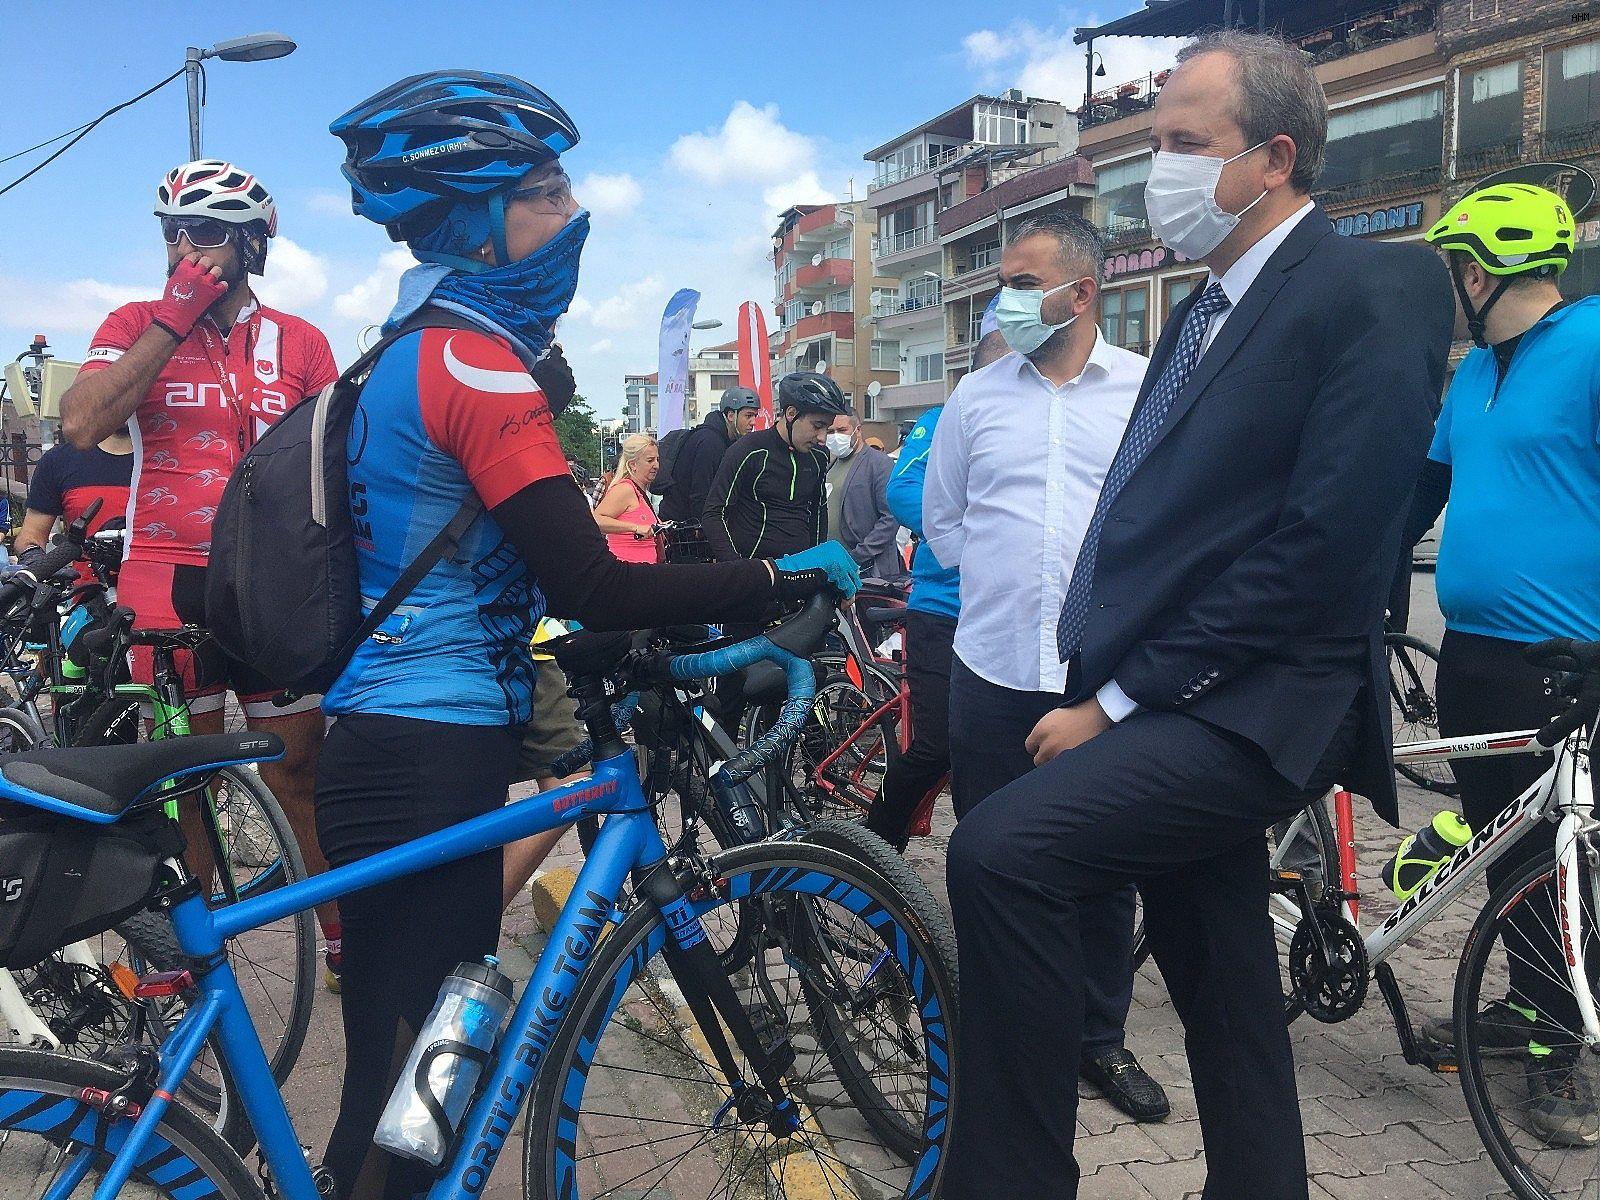 2021/06/avcilarda-bisikletseverler-dunya-bisiklet-gunu-icin-pedal-cevirdi-20210603AW33-2.jpg